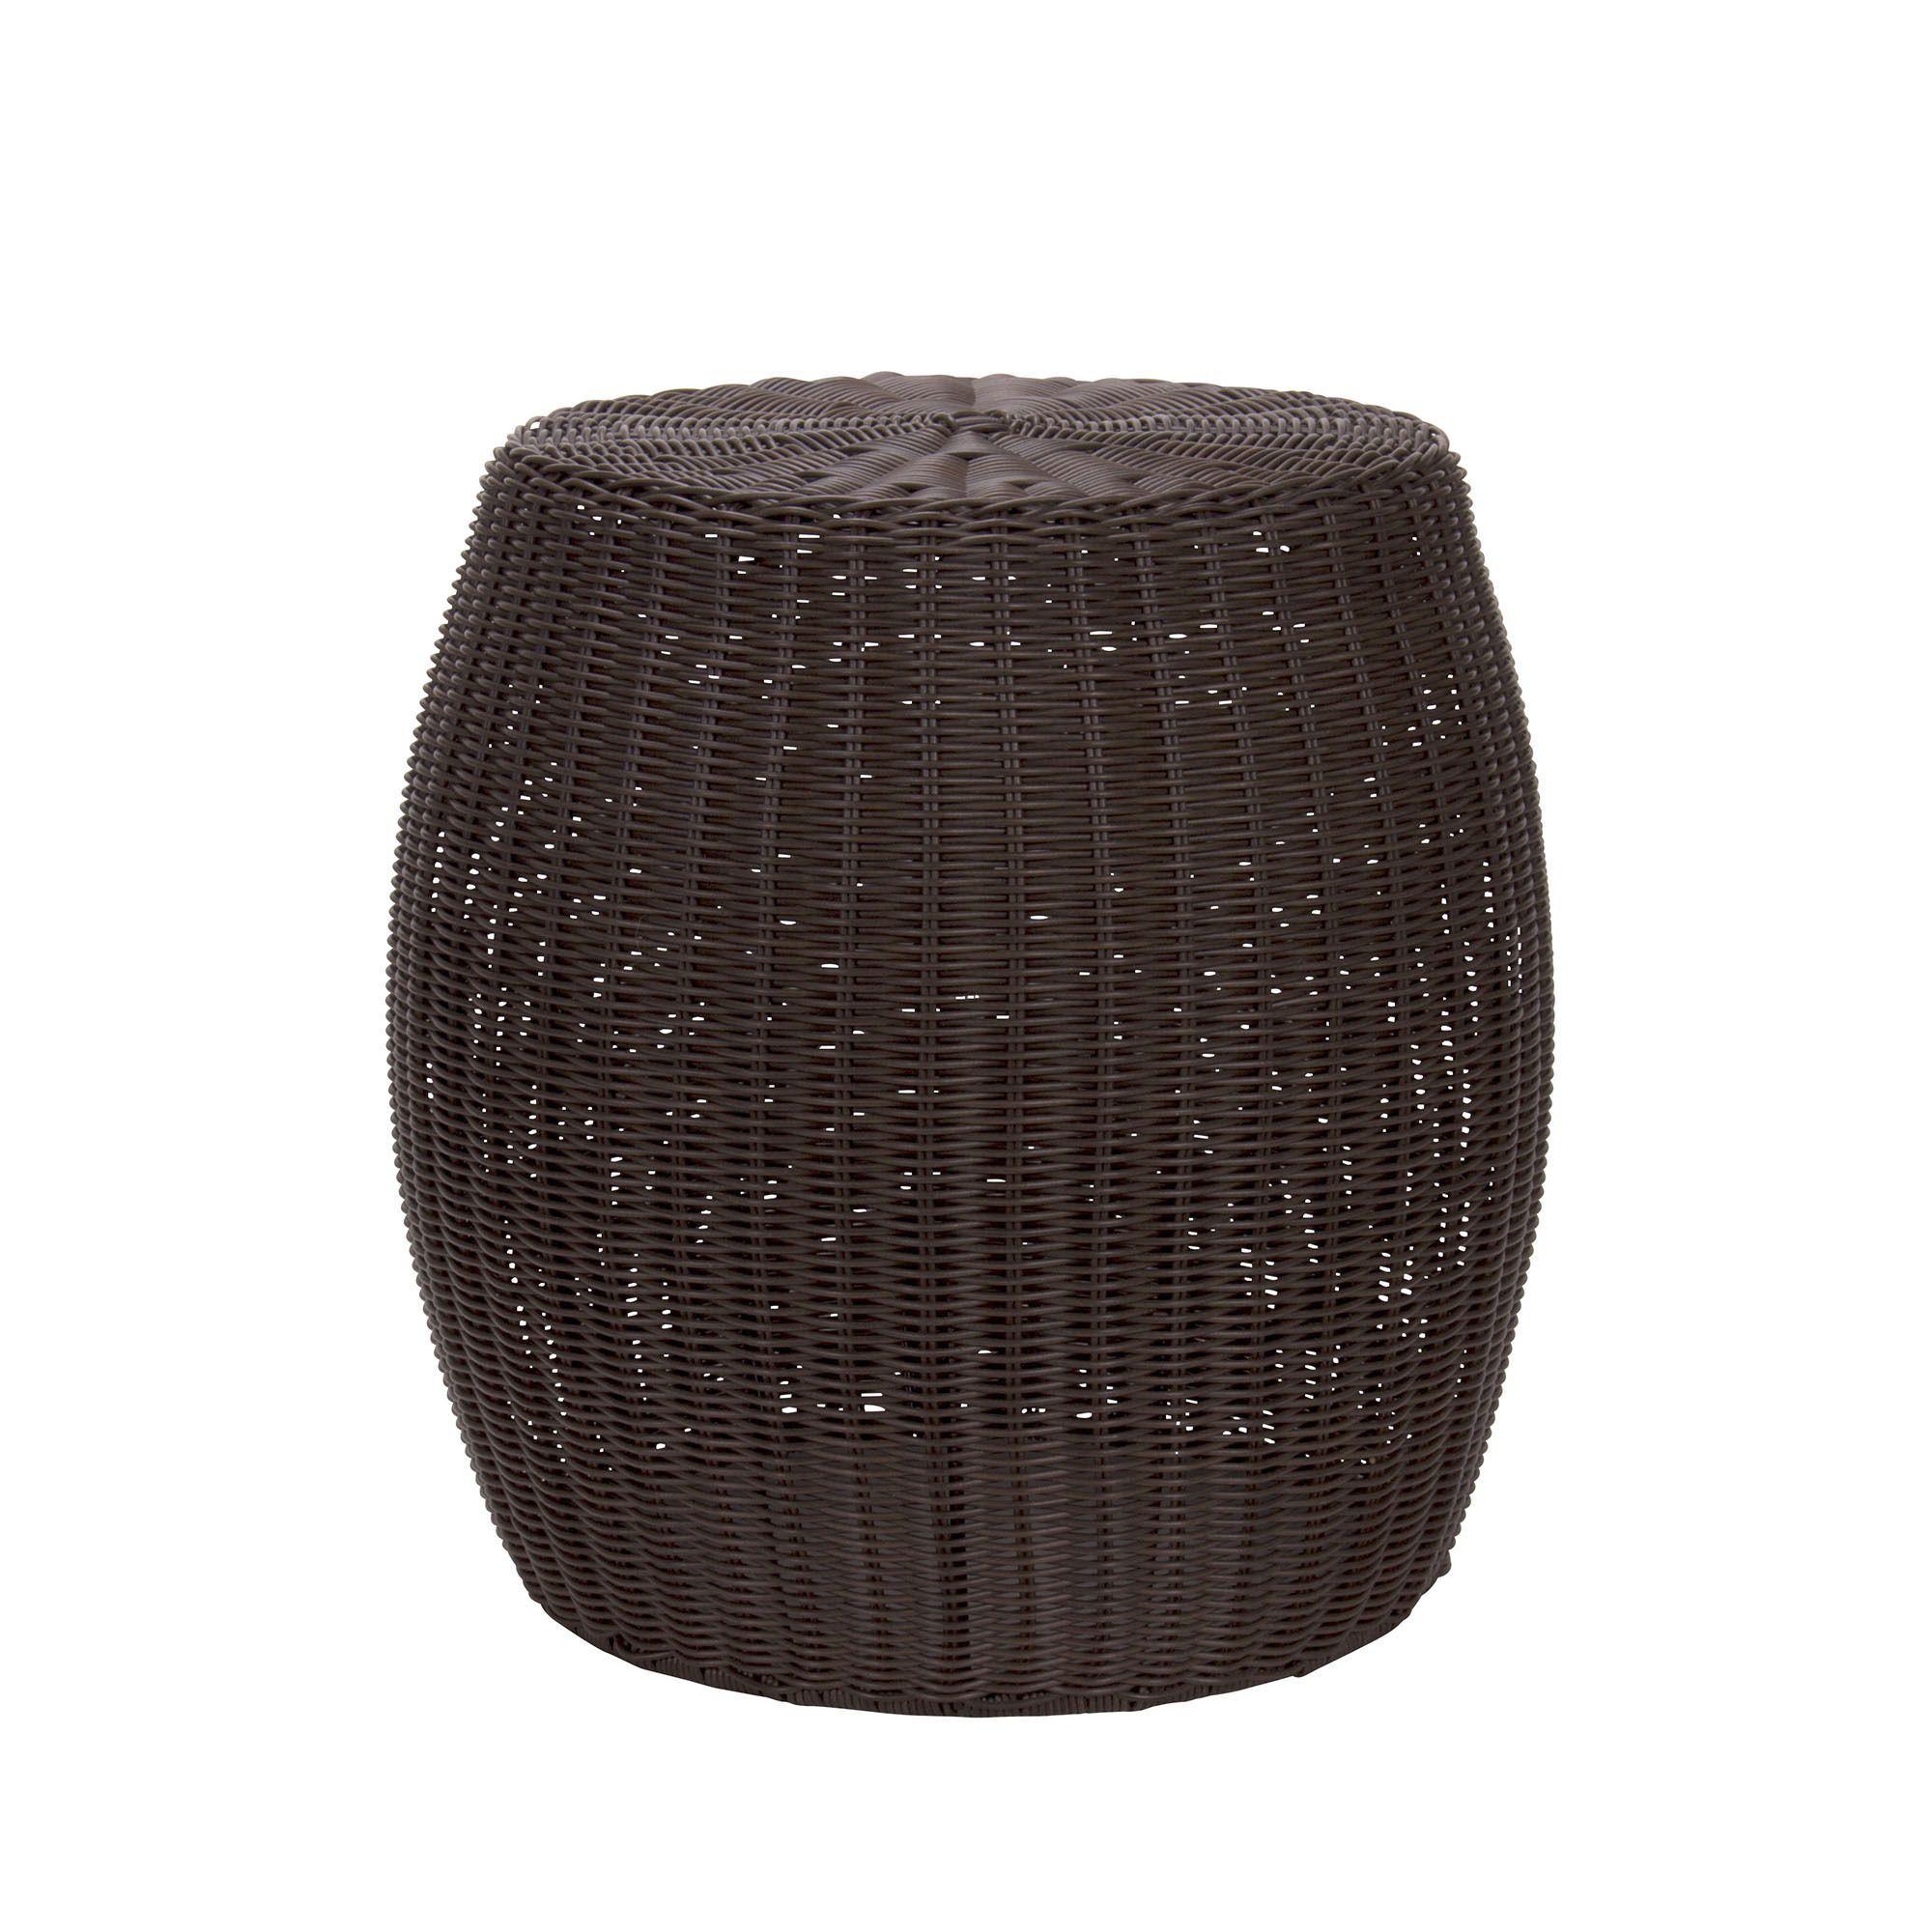 Household Essentials Resin Wicker Barrel Table,